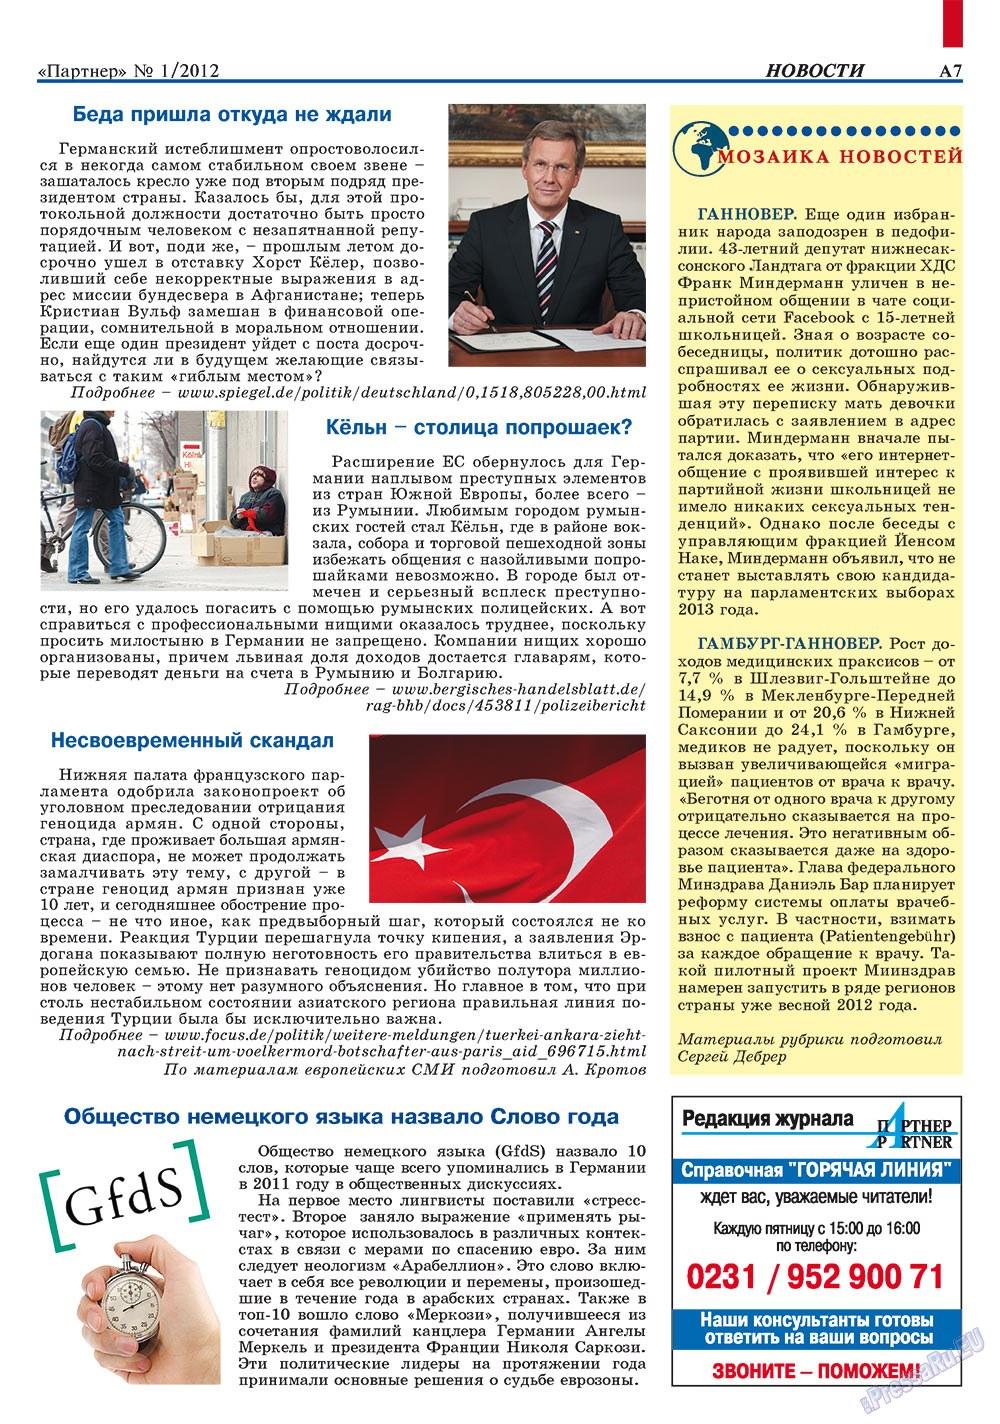 Партнер-север (журнал). 2012 год, номер 1, стр. 7